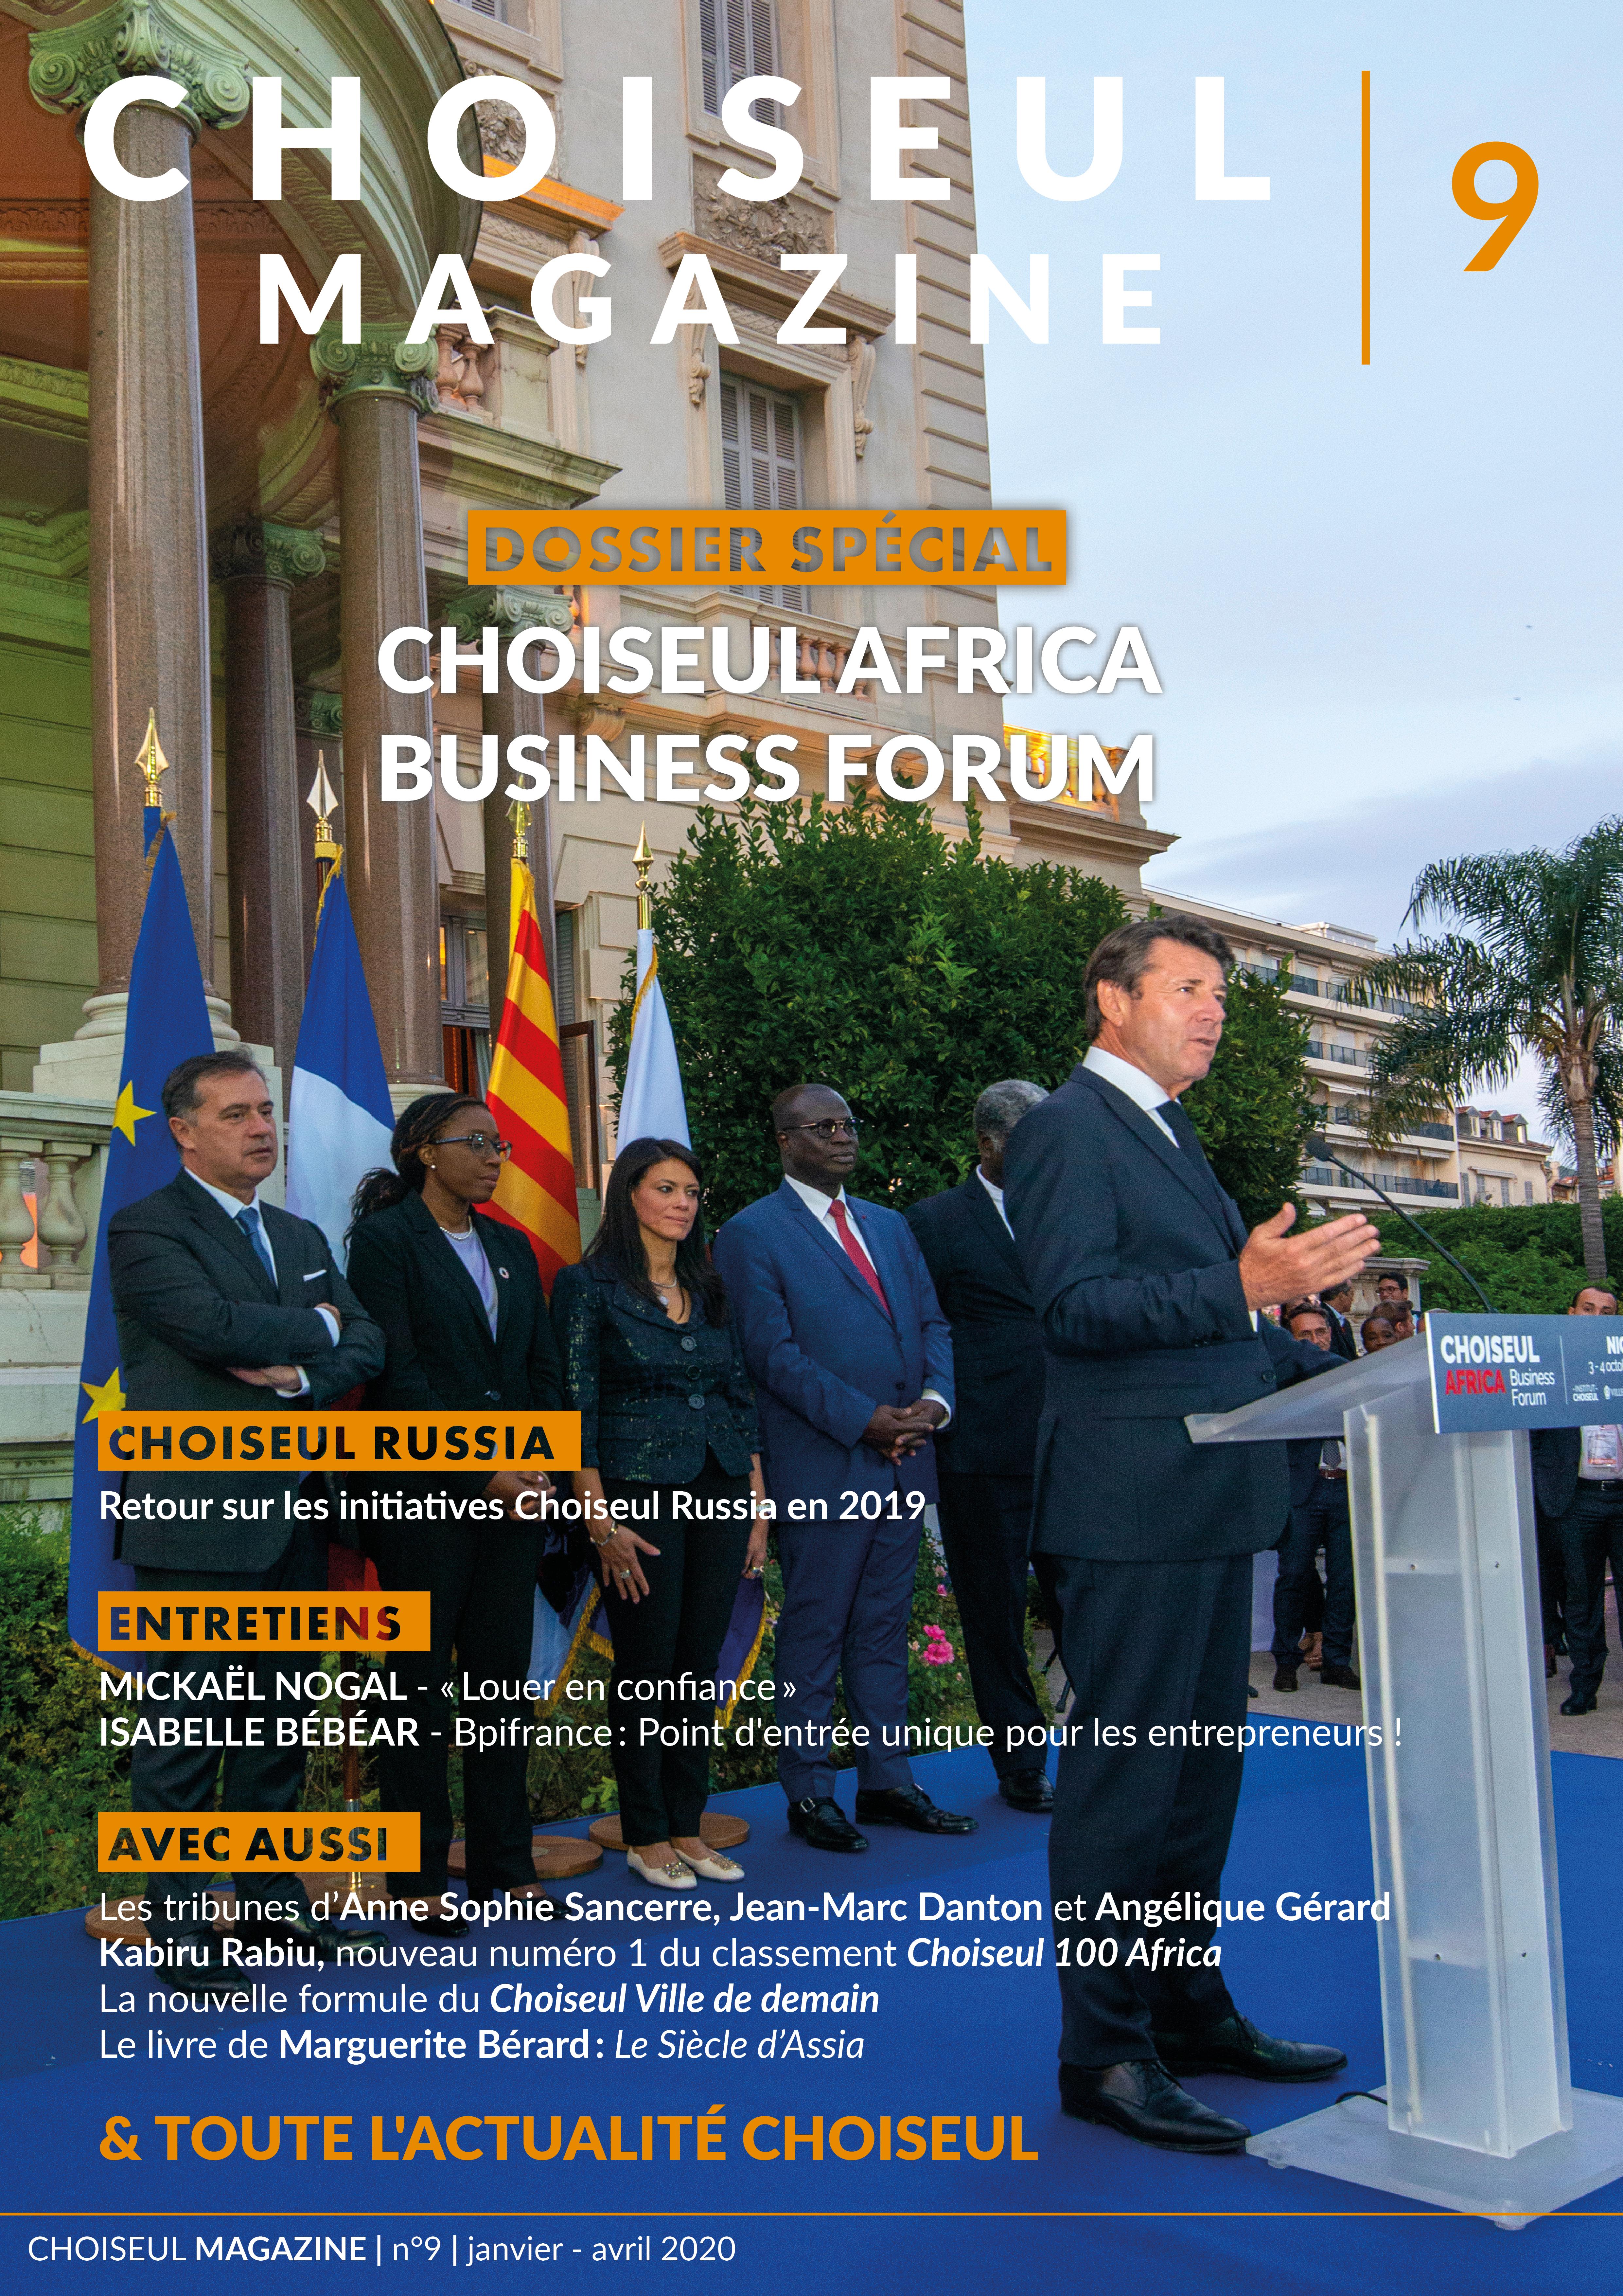 Choiseul Magazine n°9